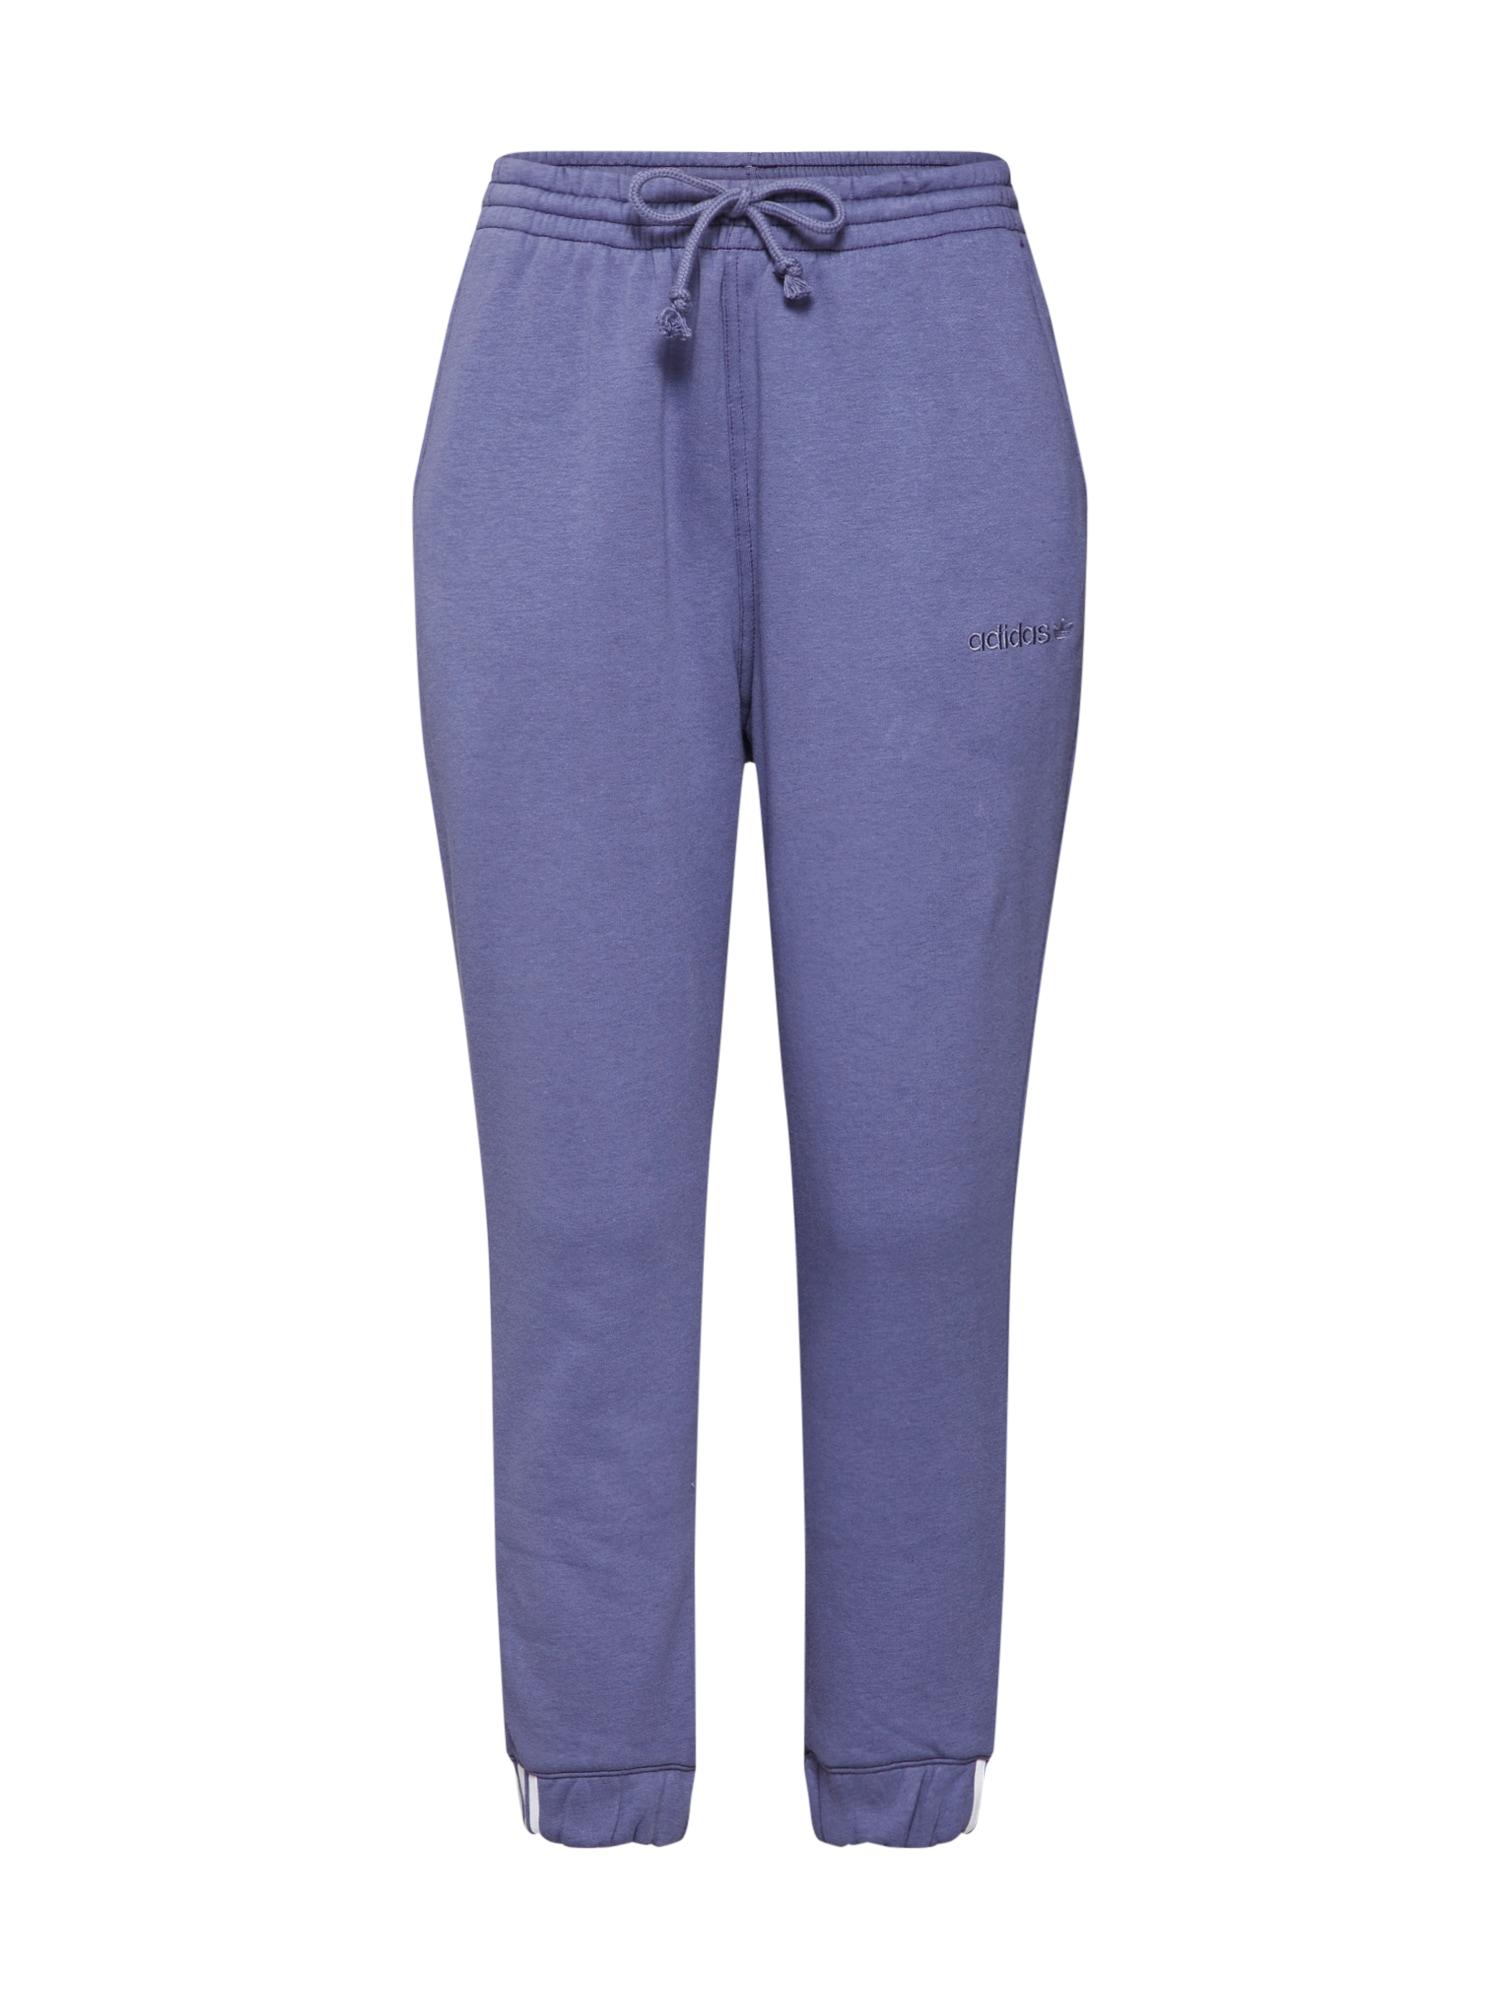 Kalhoty šeříková ADIDAS ORIGINALS